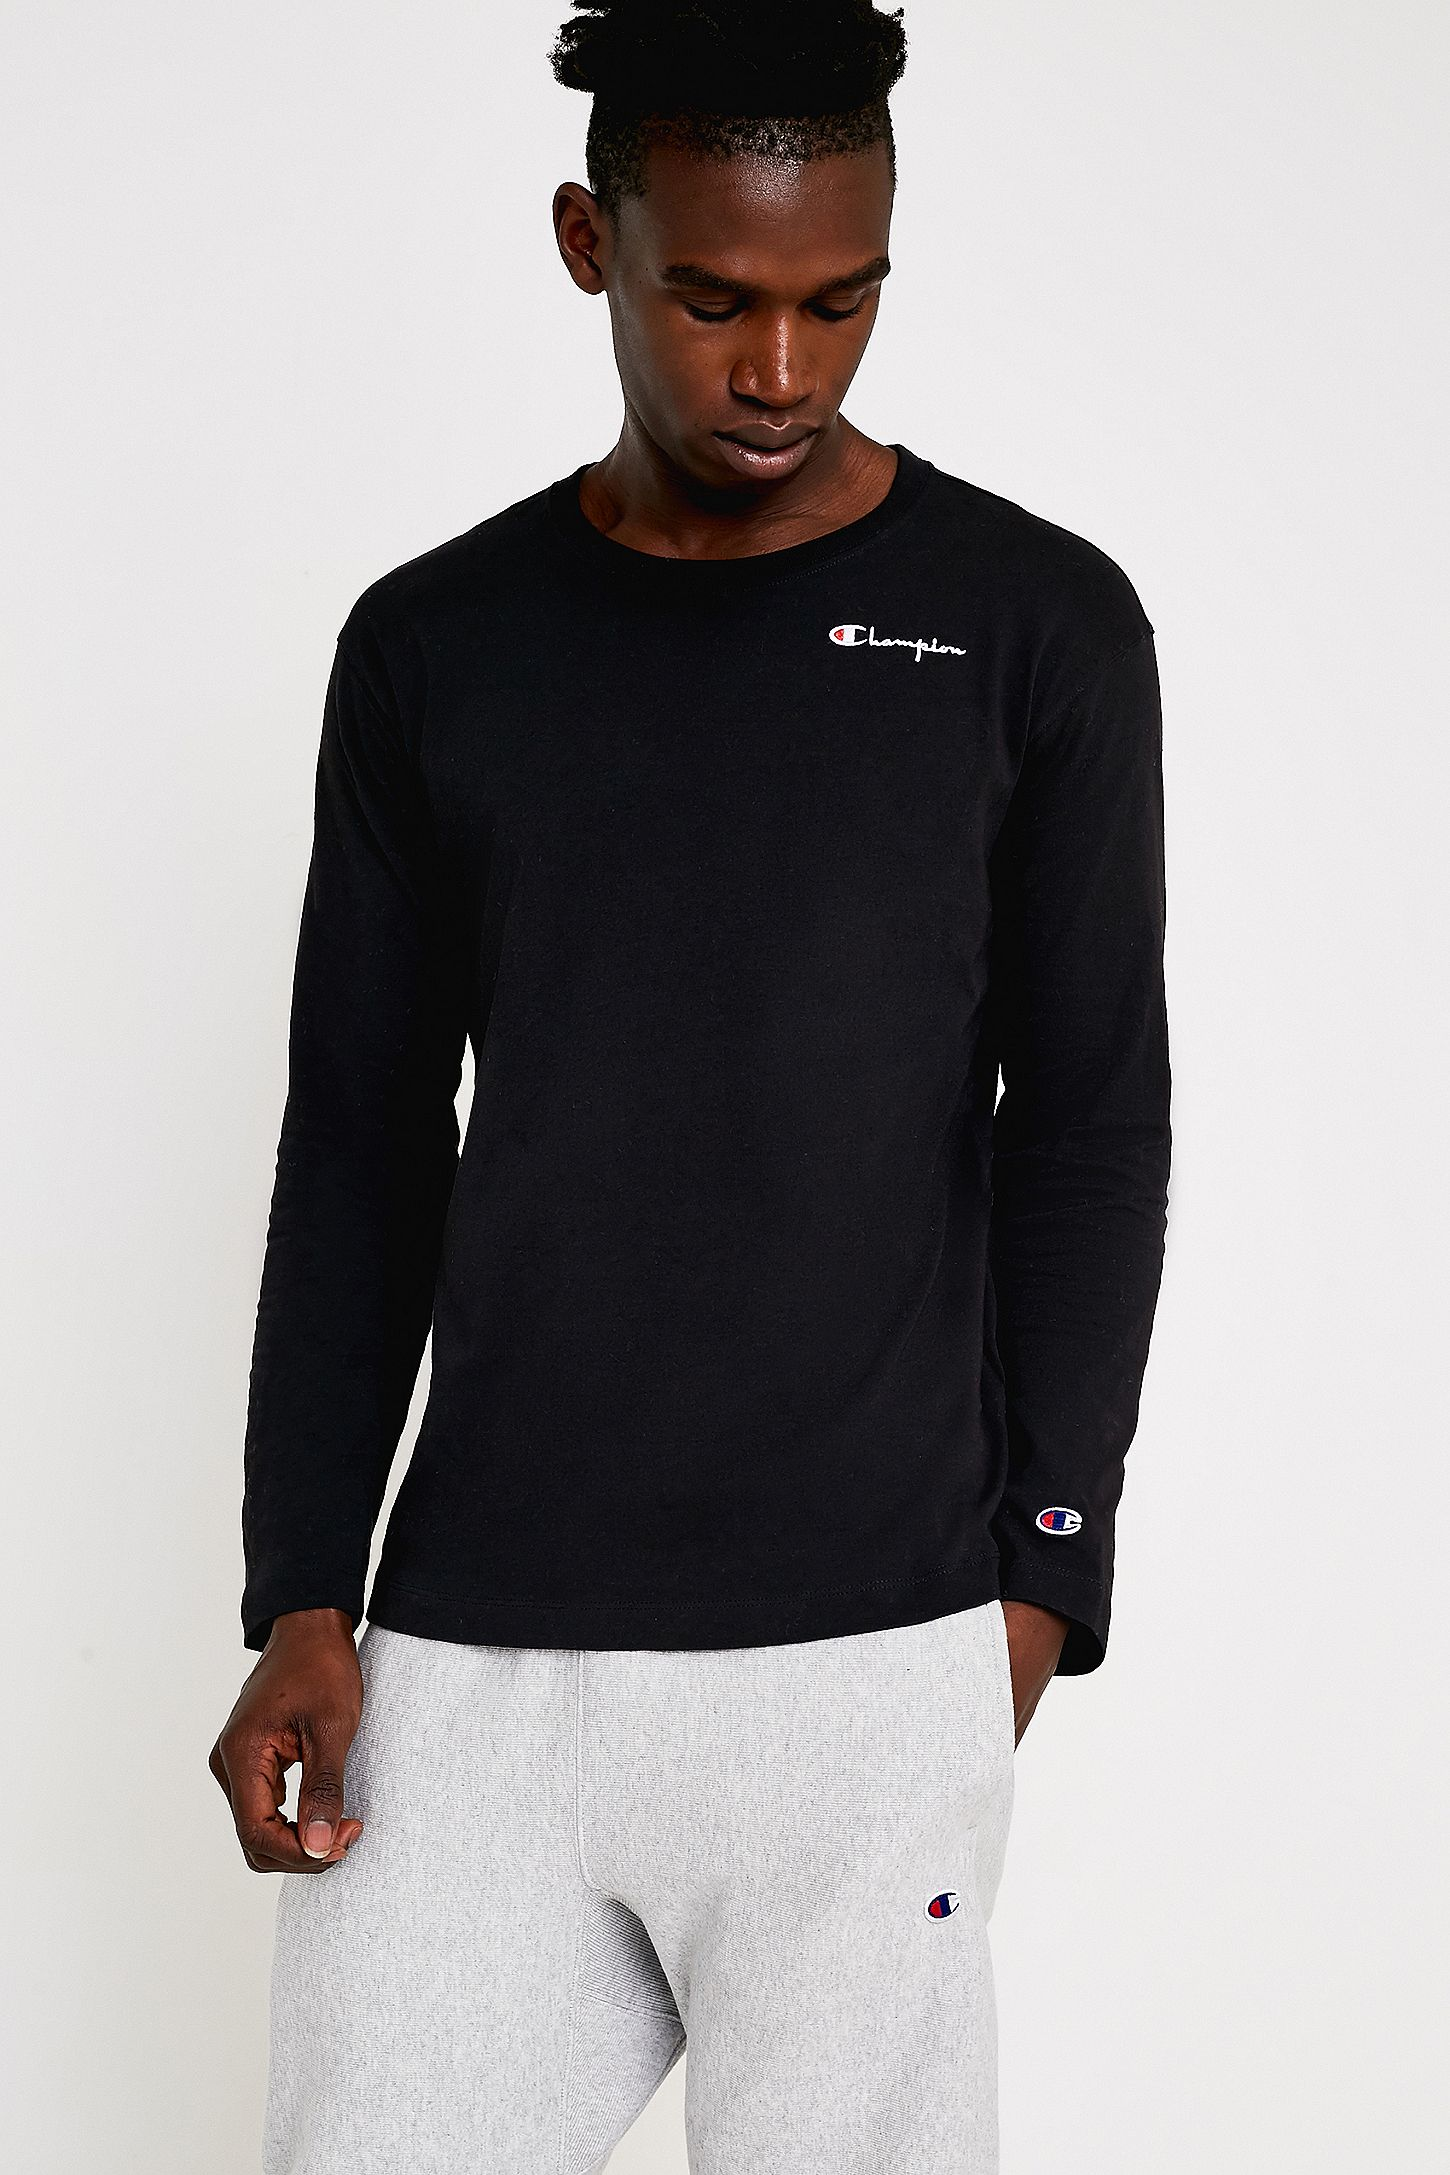 3de9062f81e4 Champion Black Script Logo Slim-Fit Long-Sleeve T-Shirt | Urban ...